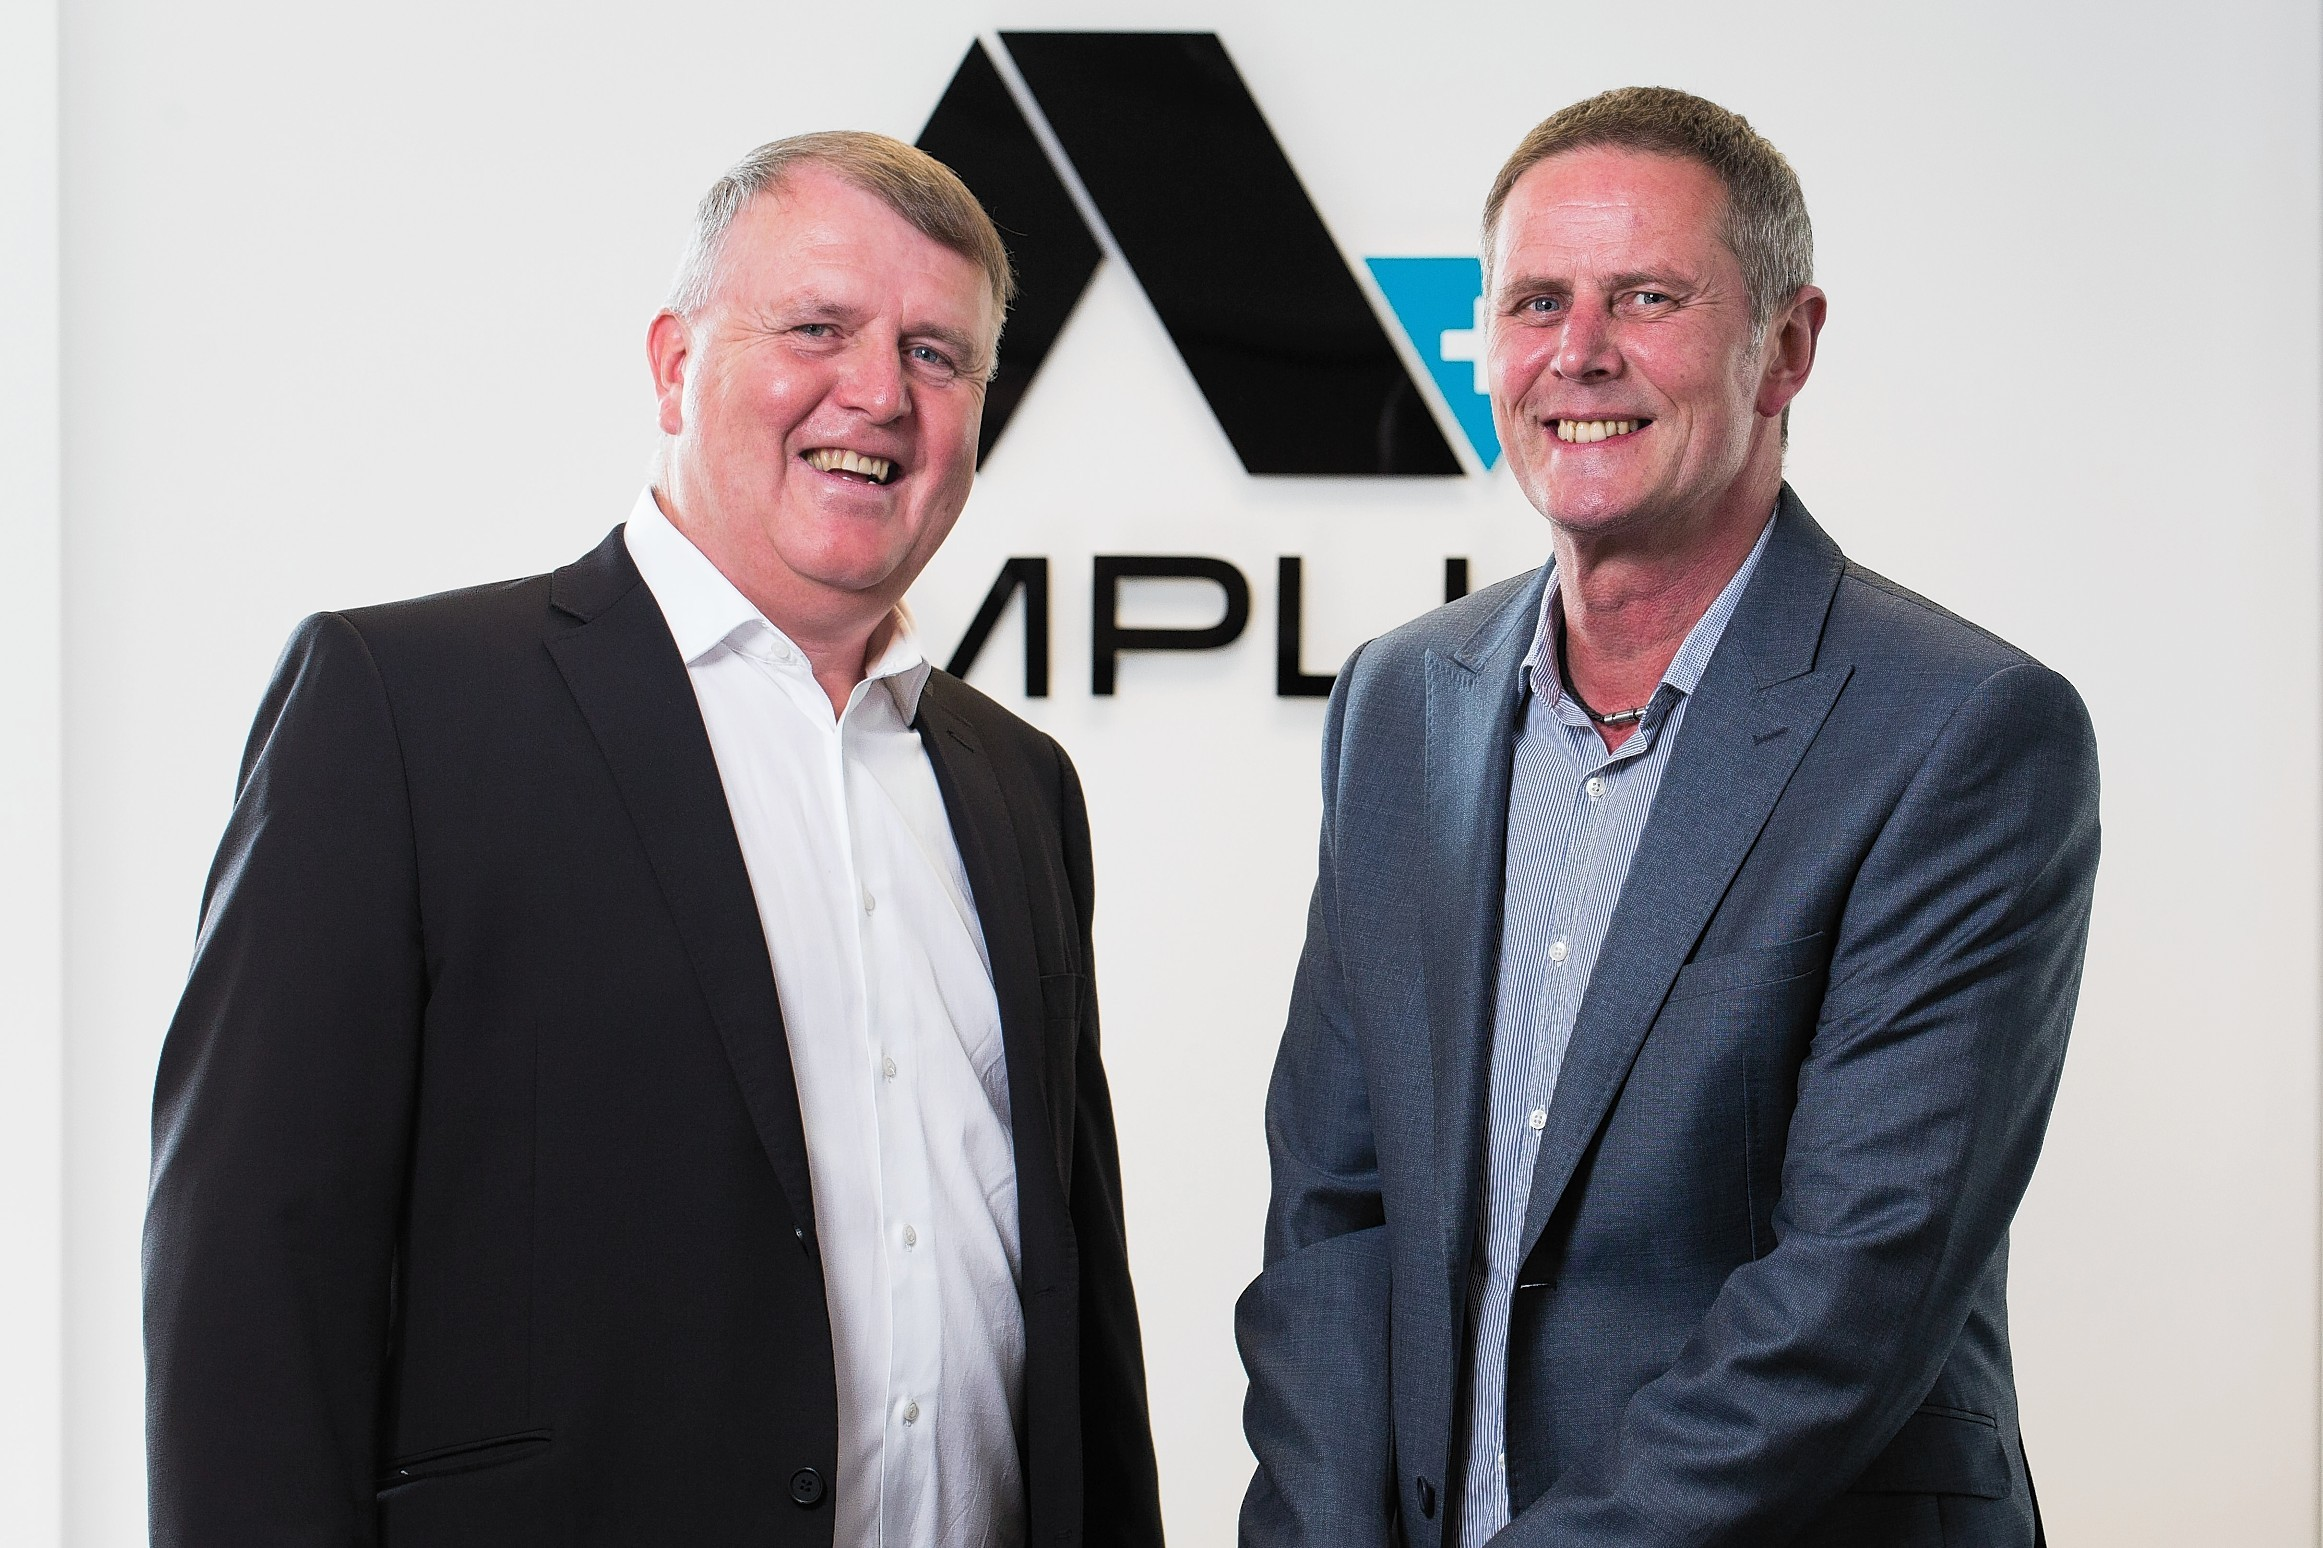 Ian Herd, managing director of Amplus Energy, left, with Stuart Reid, managing director of Andrews Survey